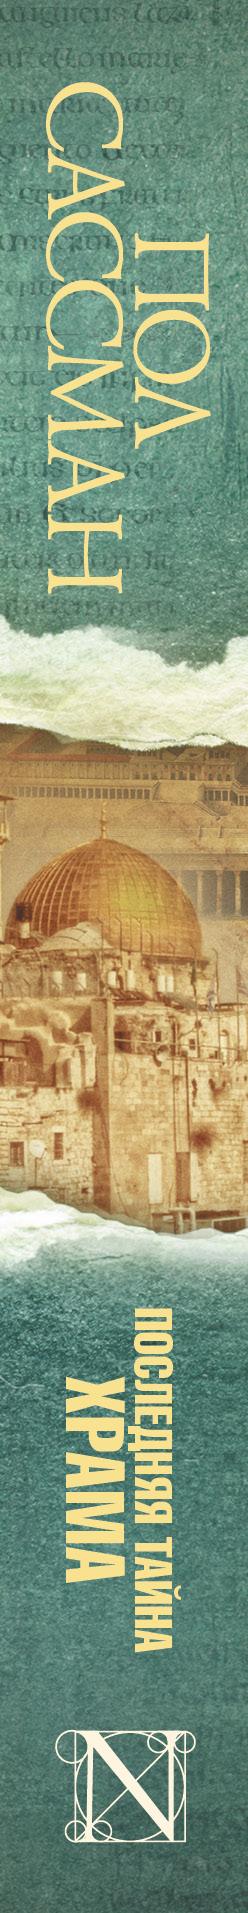 Последняя тайна Храма